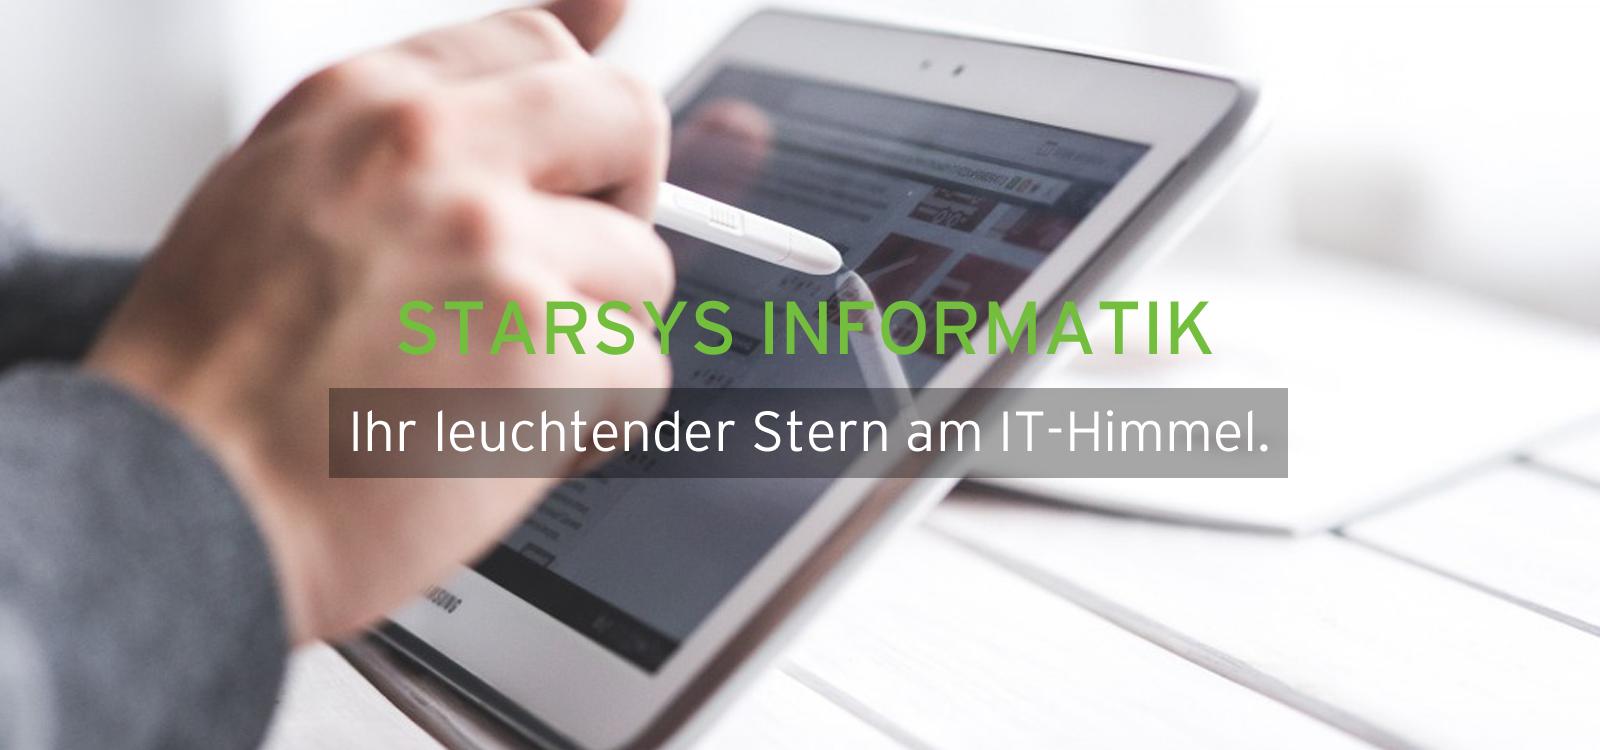 Starsys Informatik GmbH